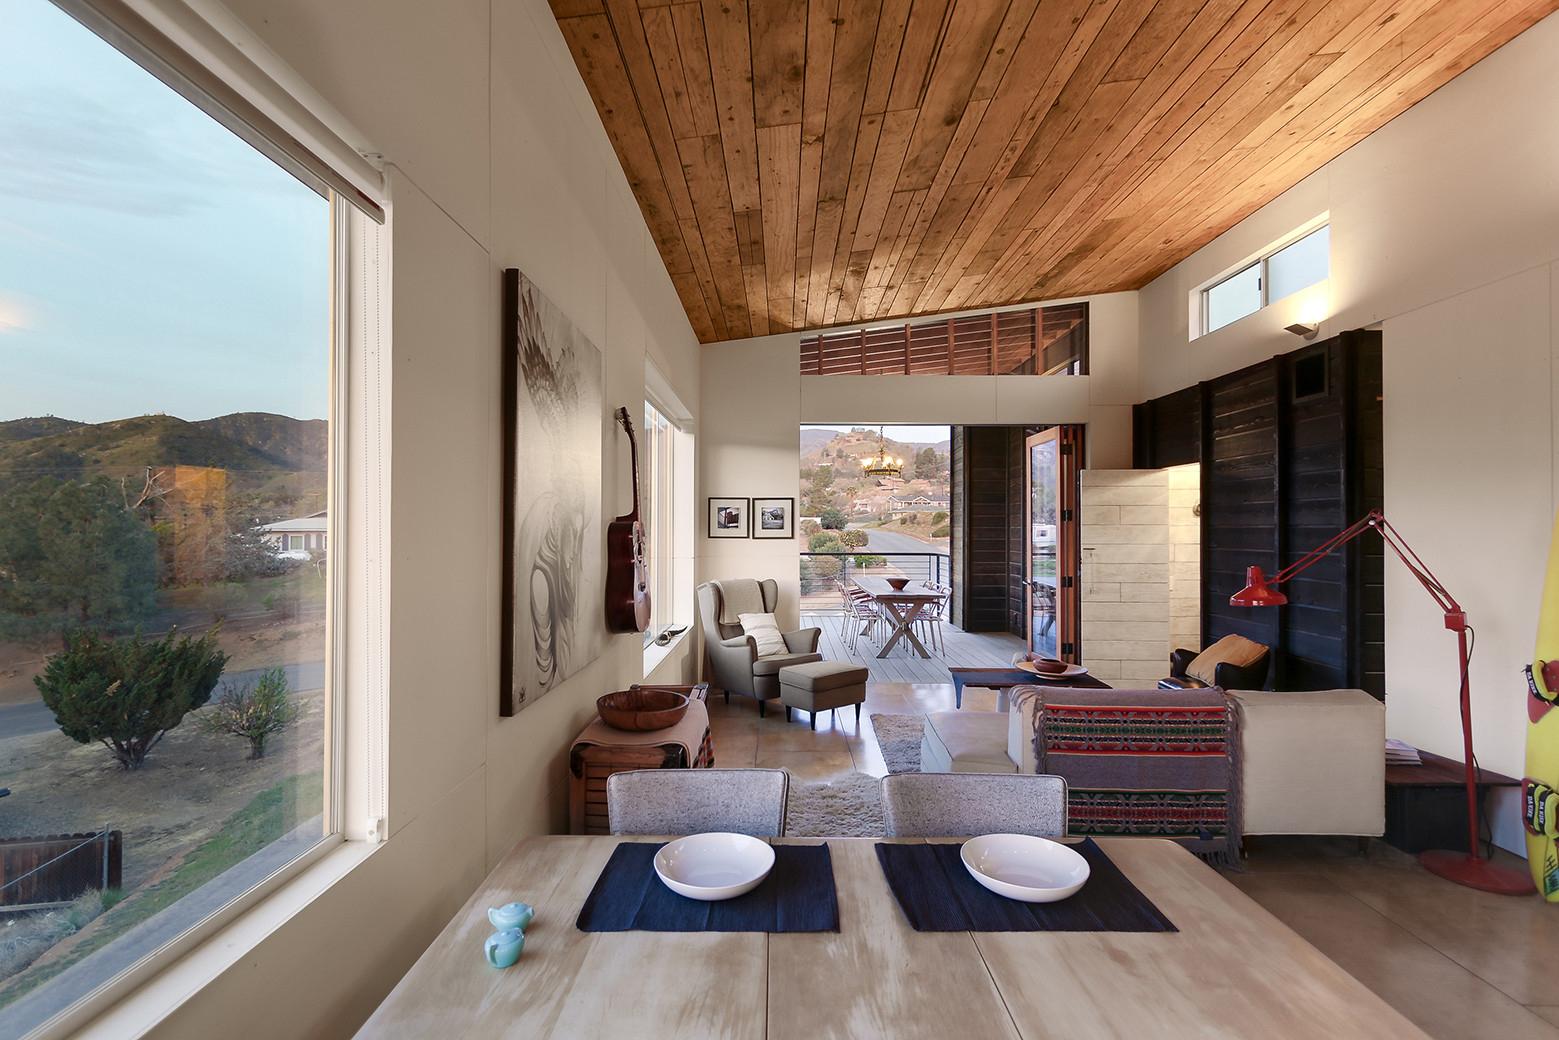 Highly Crafted Modern Desert Cabin Idesignarch Interior